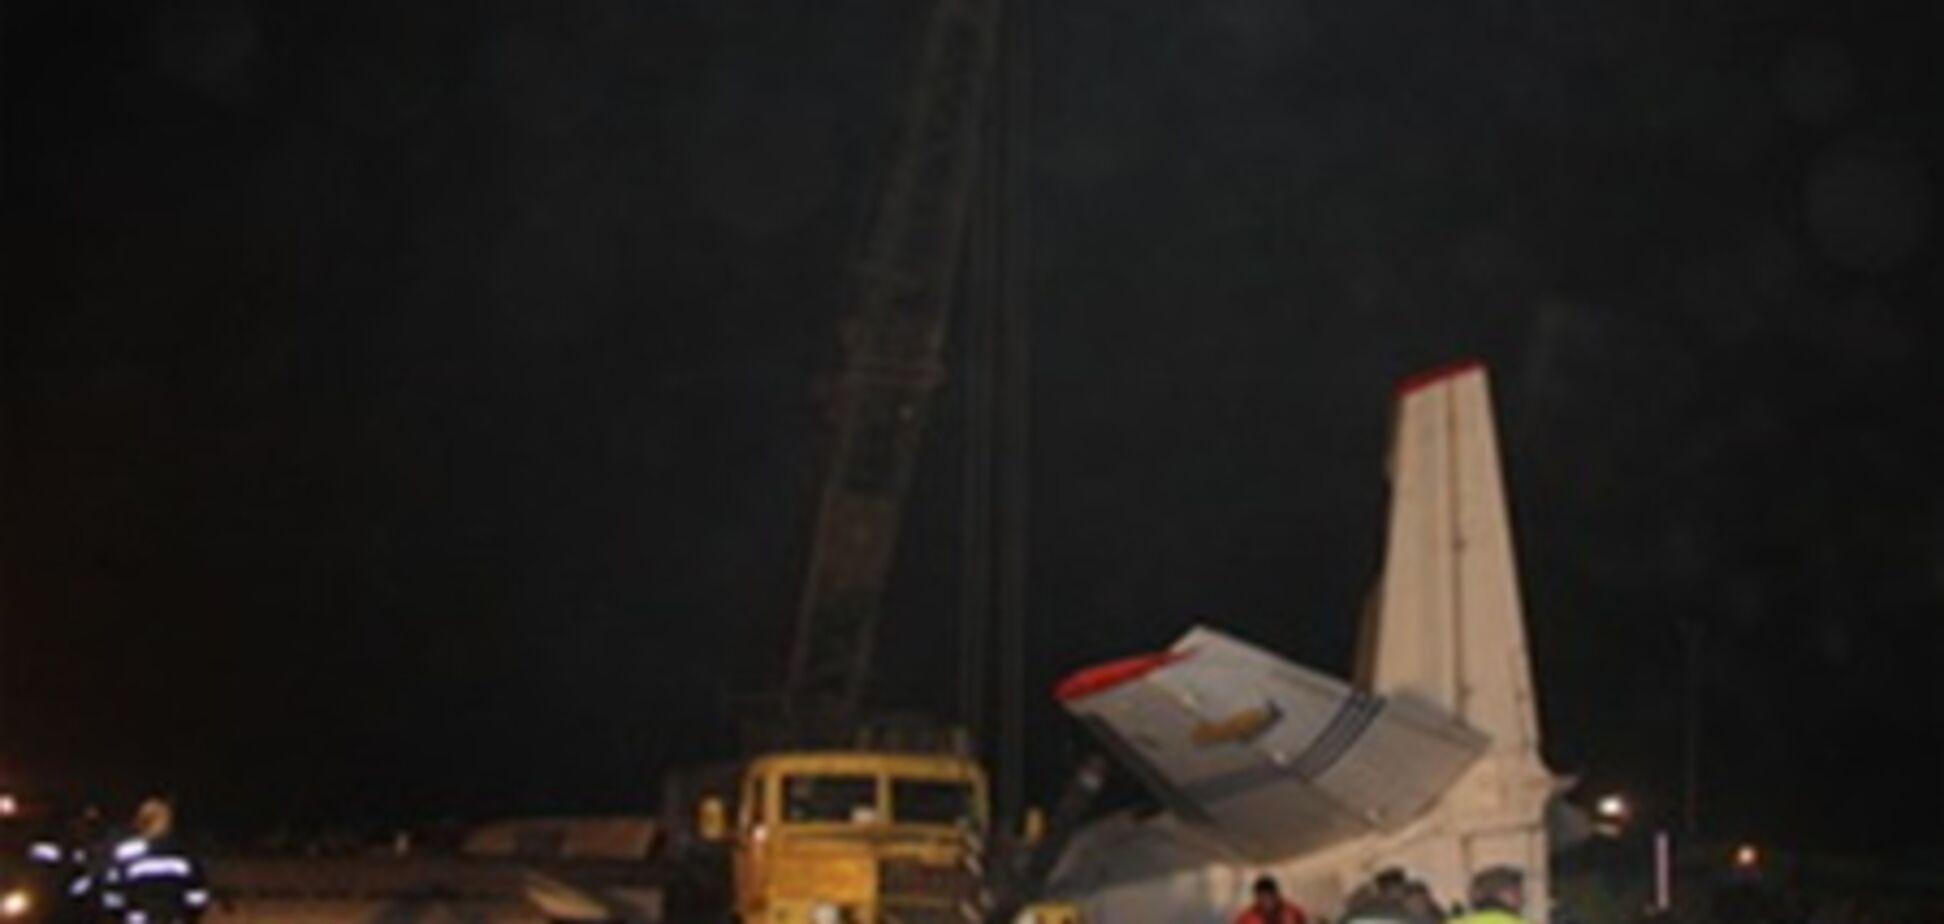 Крушение Ан-24: назначено 55 экспертиз